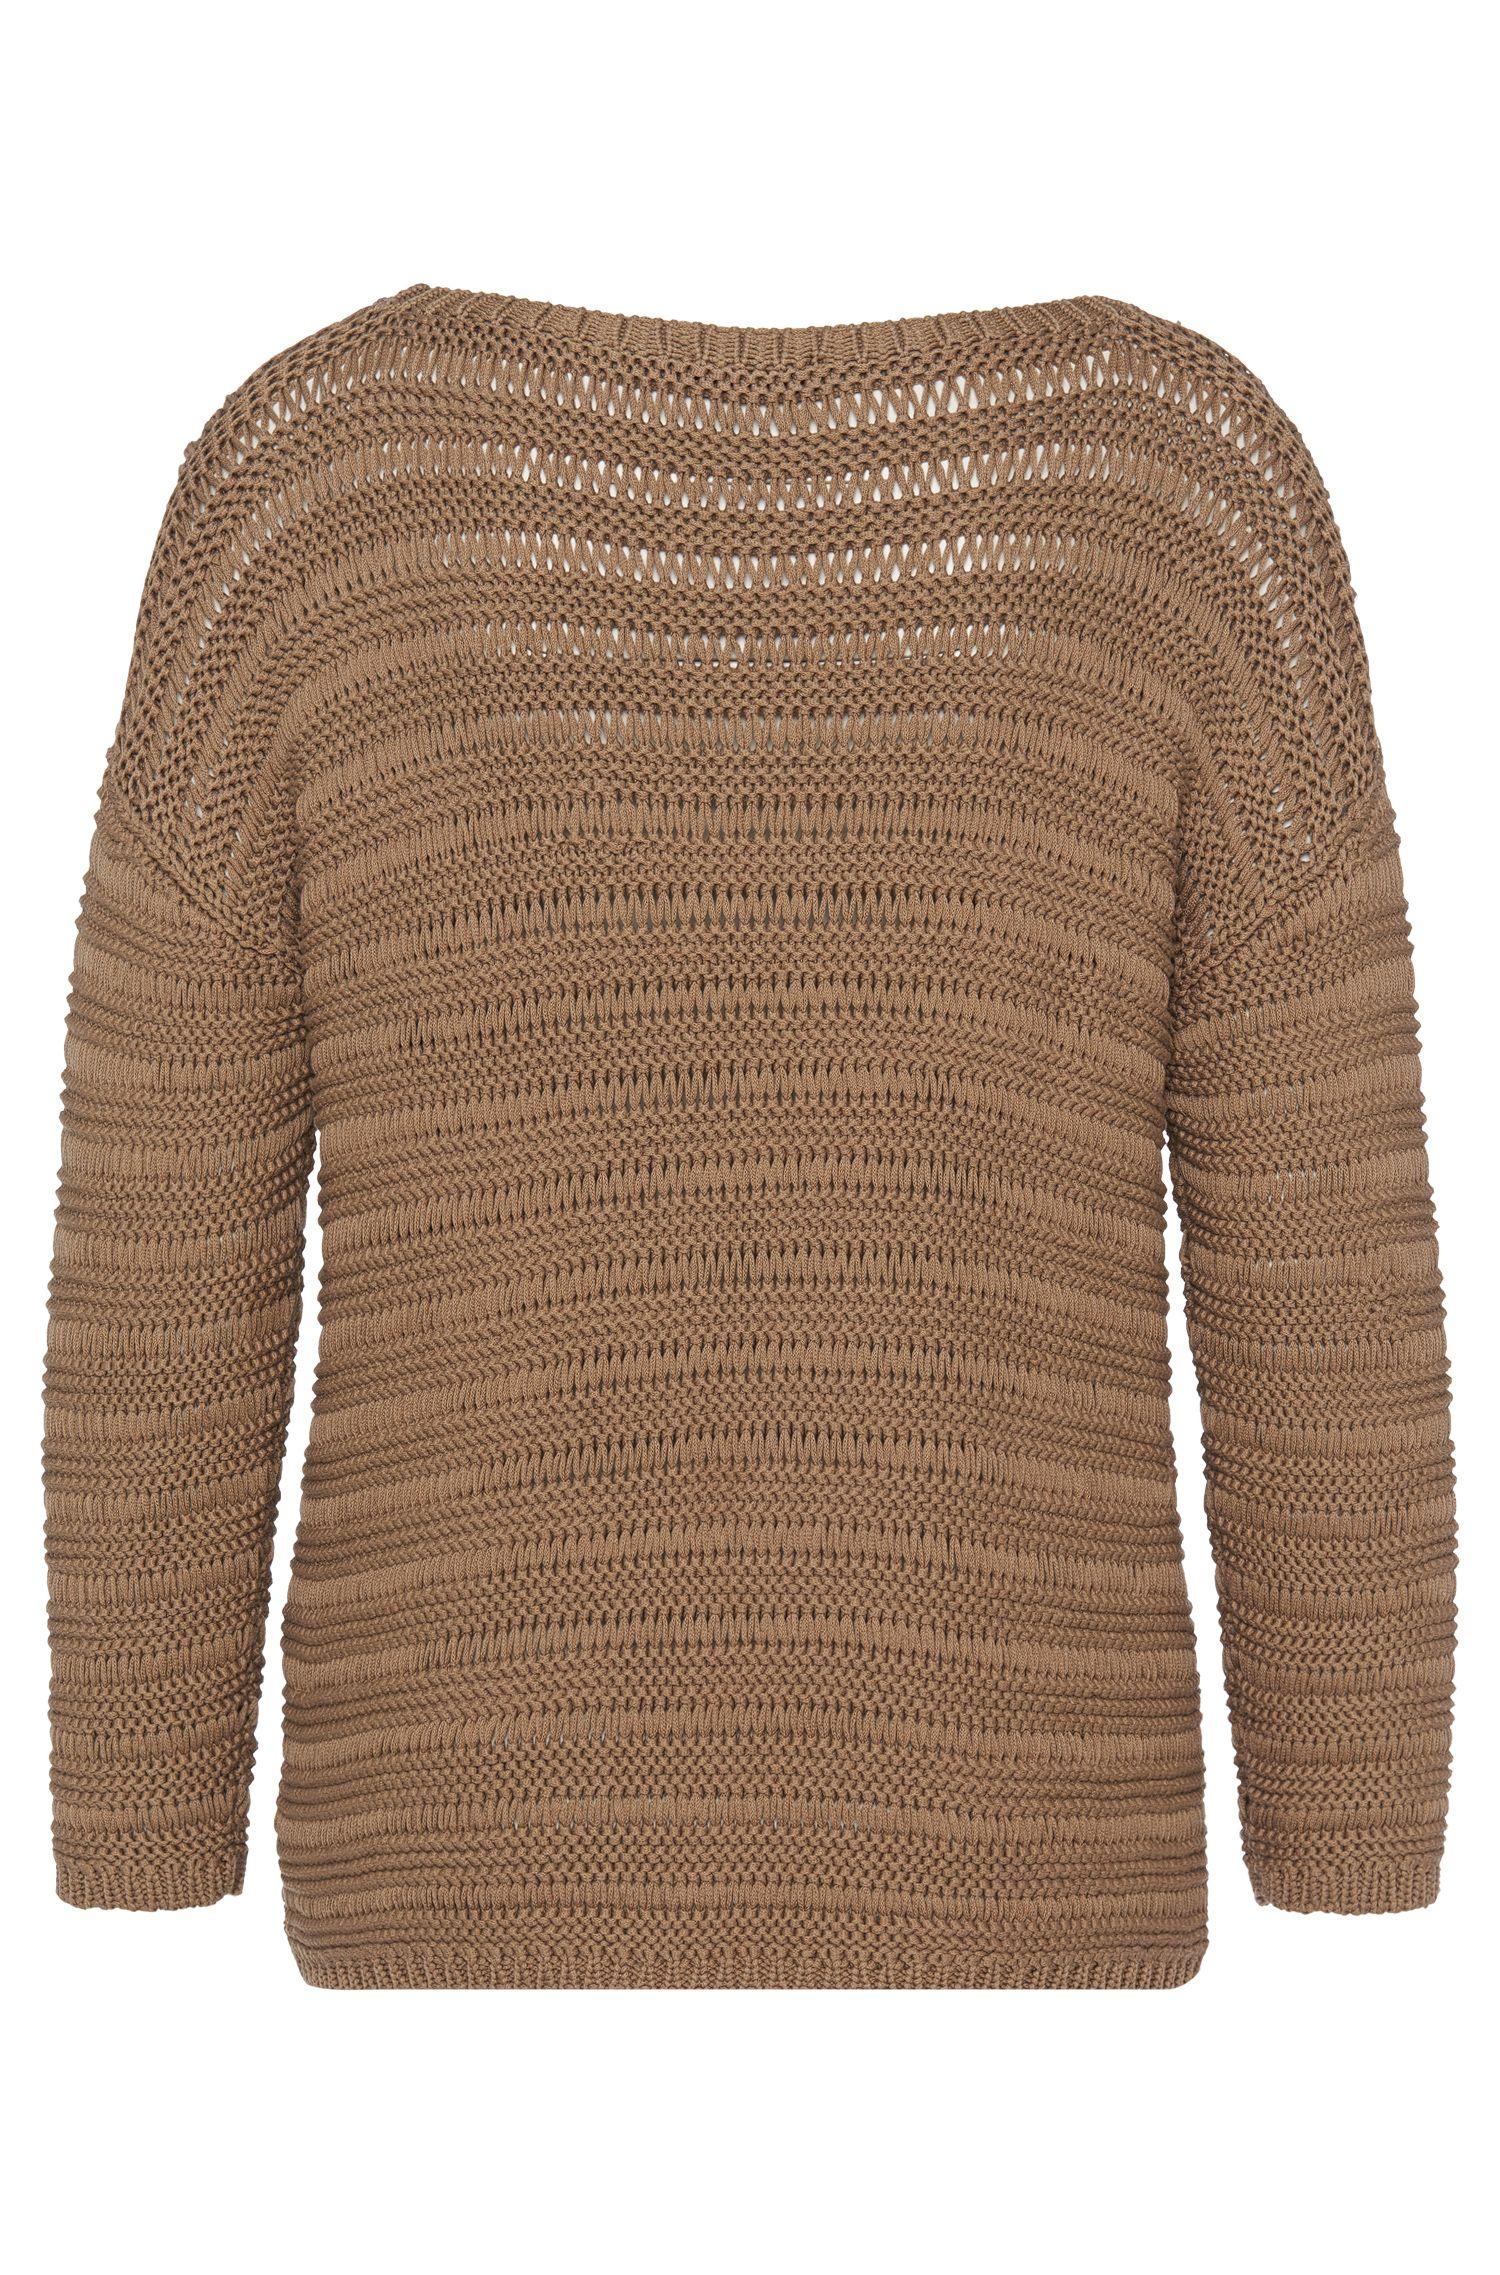 Grofgebreide trui van zuivere katoen: 'Silvetta'